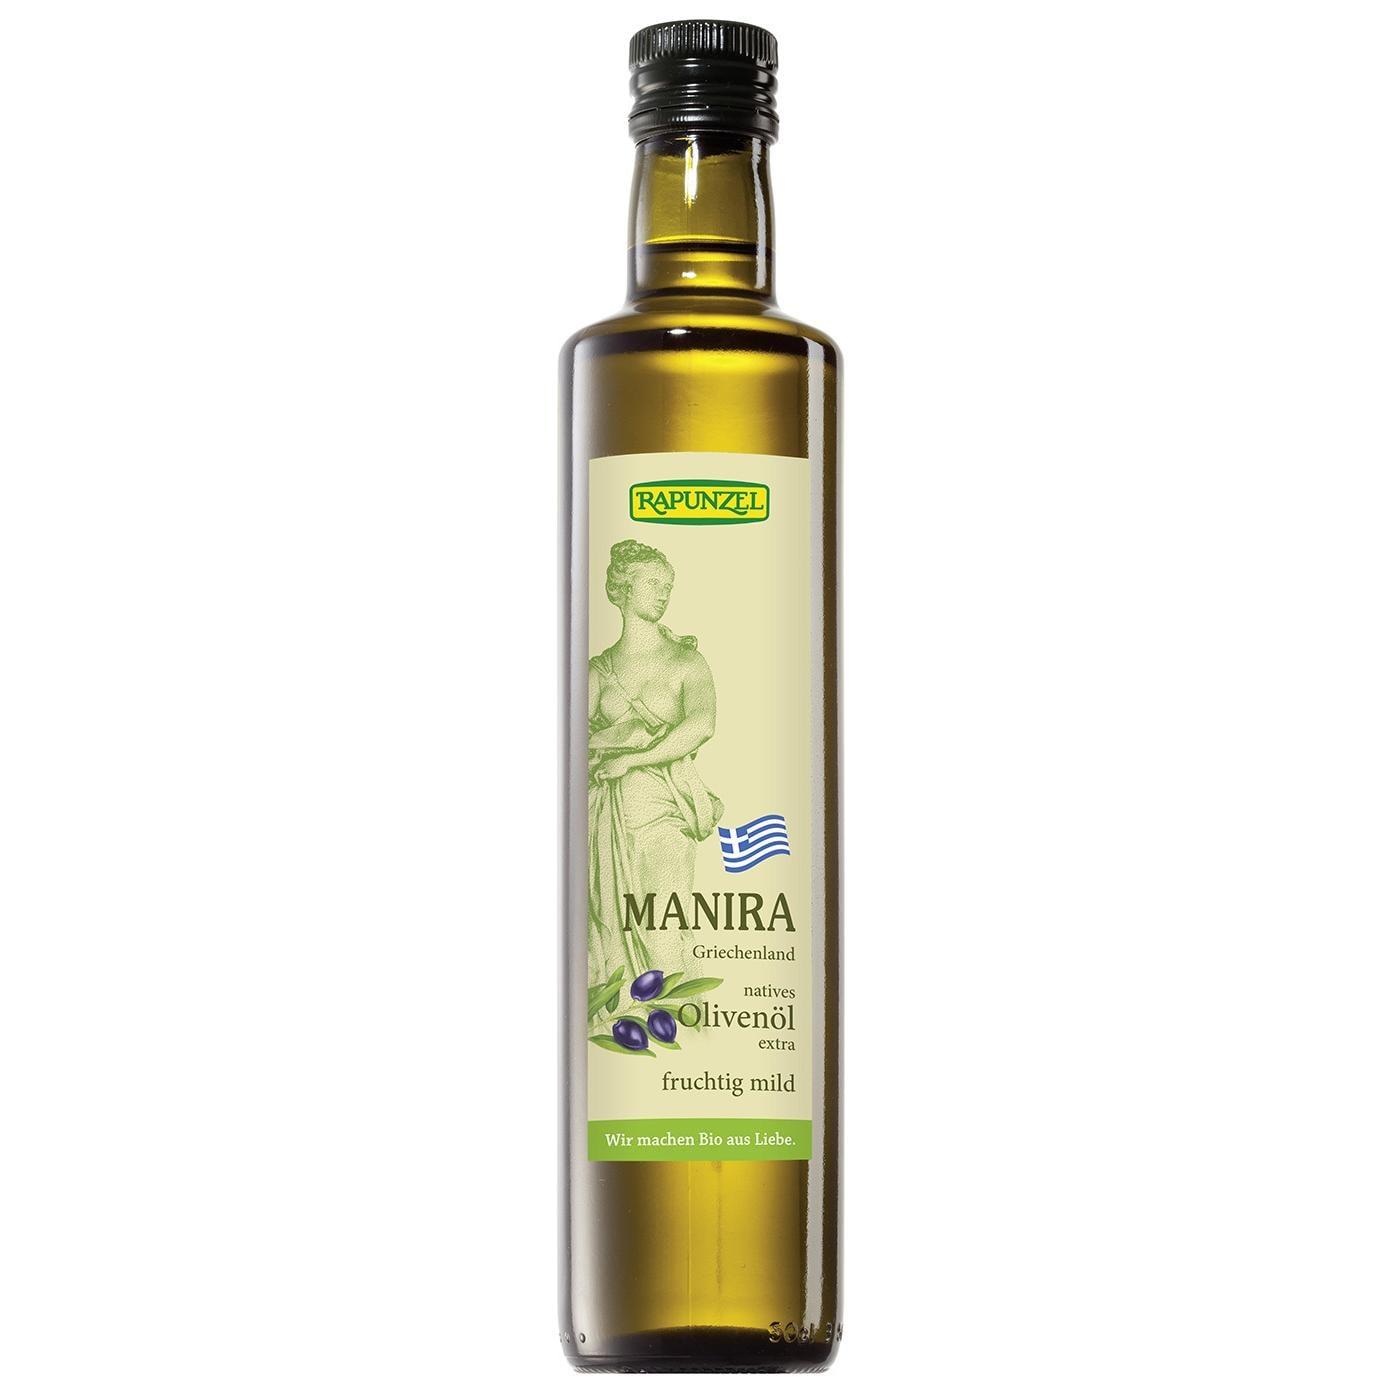 Rapunzel Bio Olivenöl Manira nativ extra 0,5l